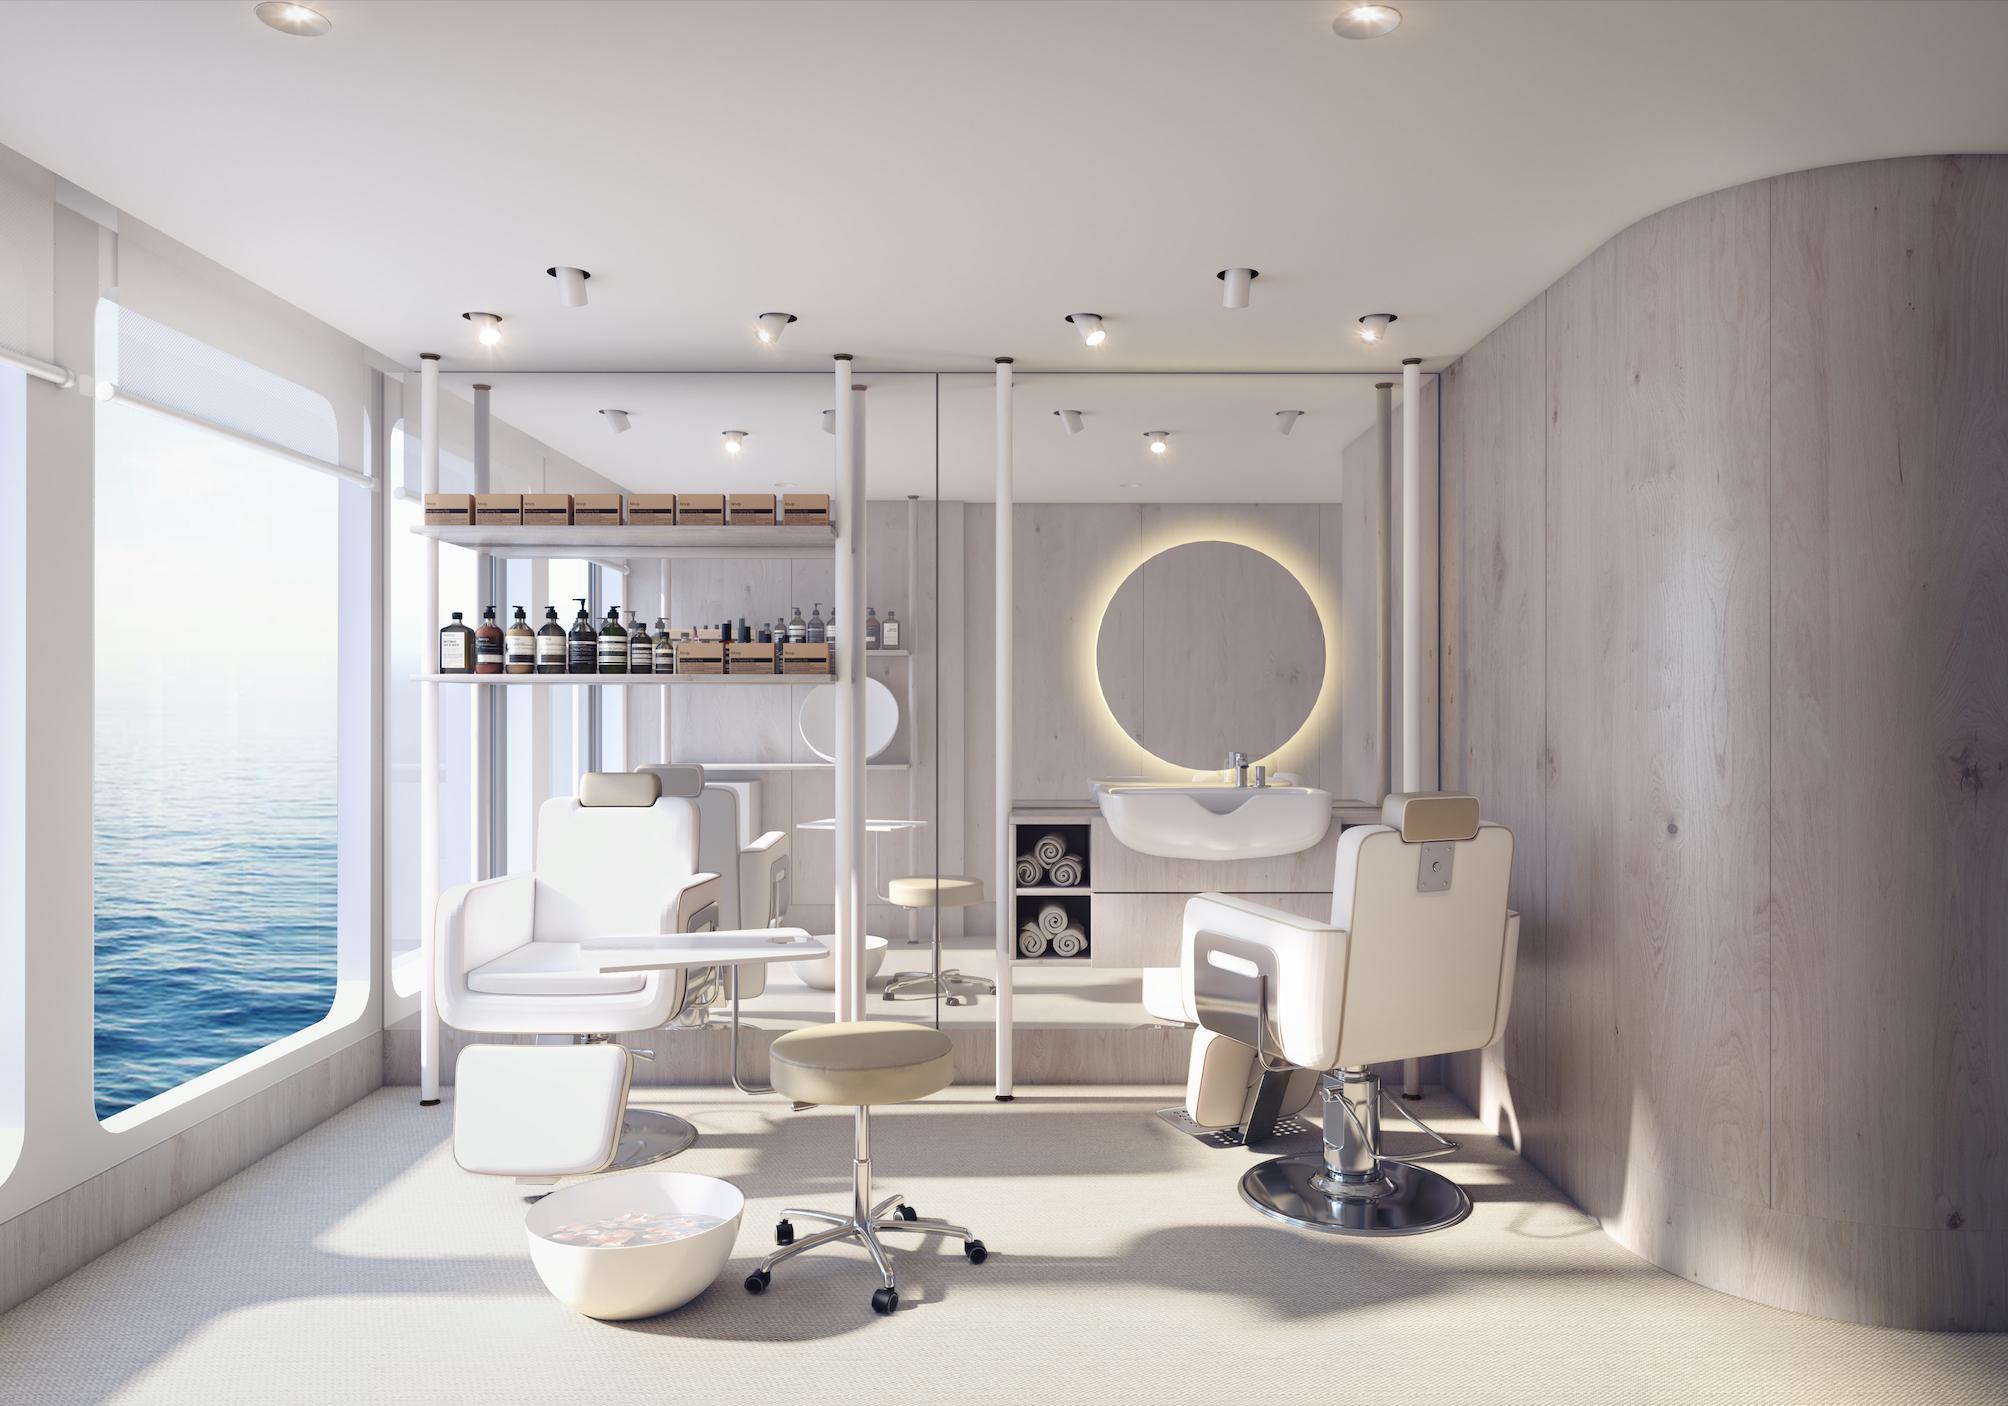 silversea Origin ruise ship salon